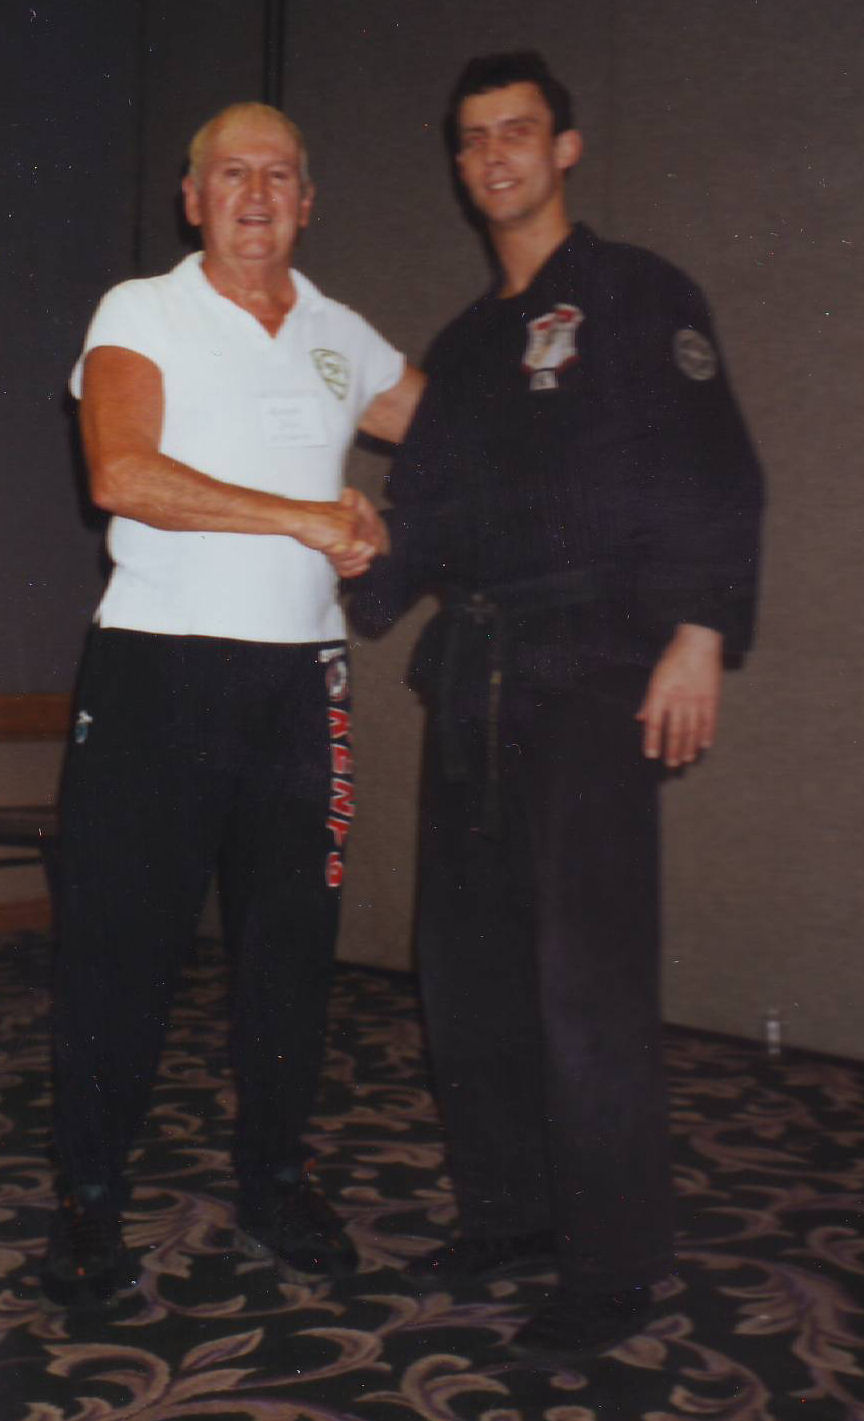 1999 Las Vegas John McSweeney-Branger